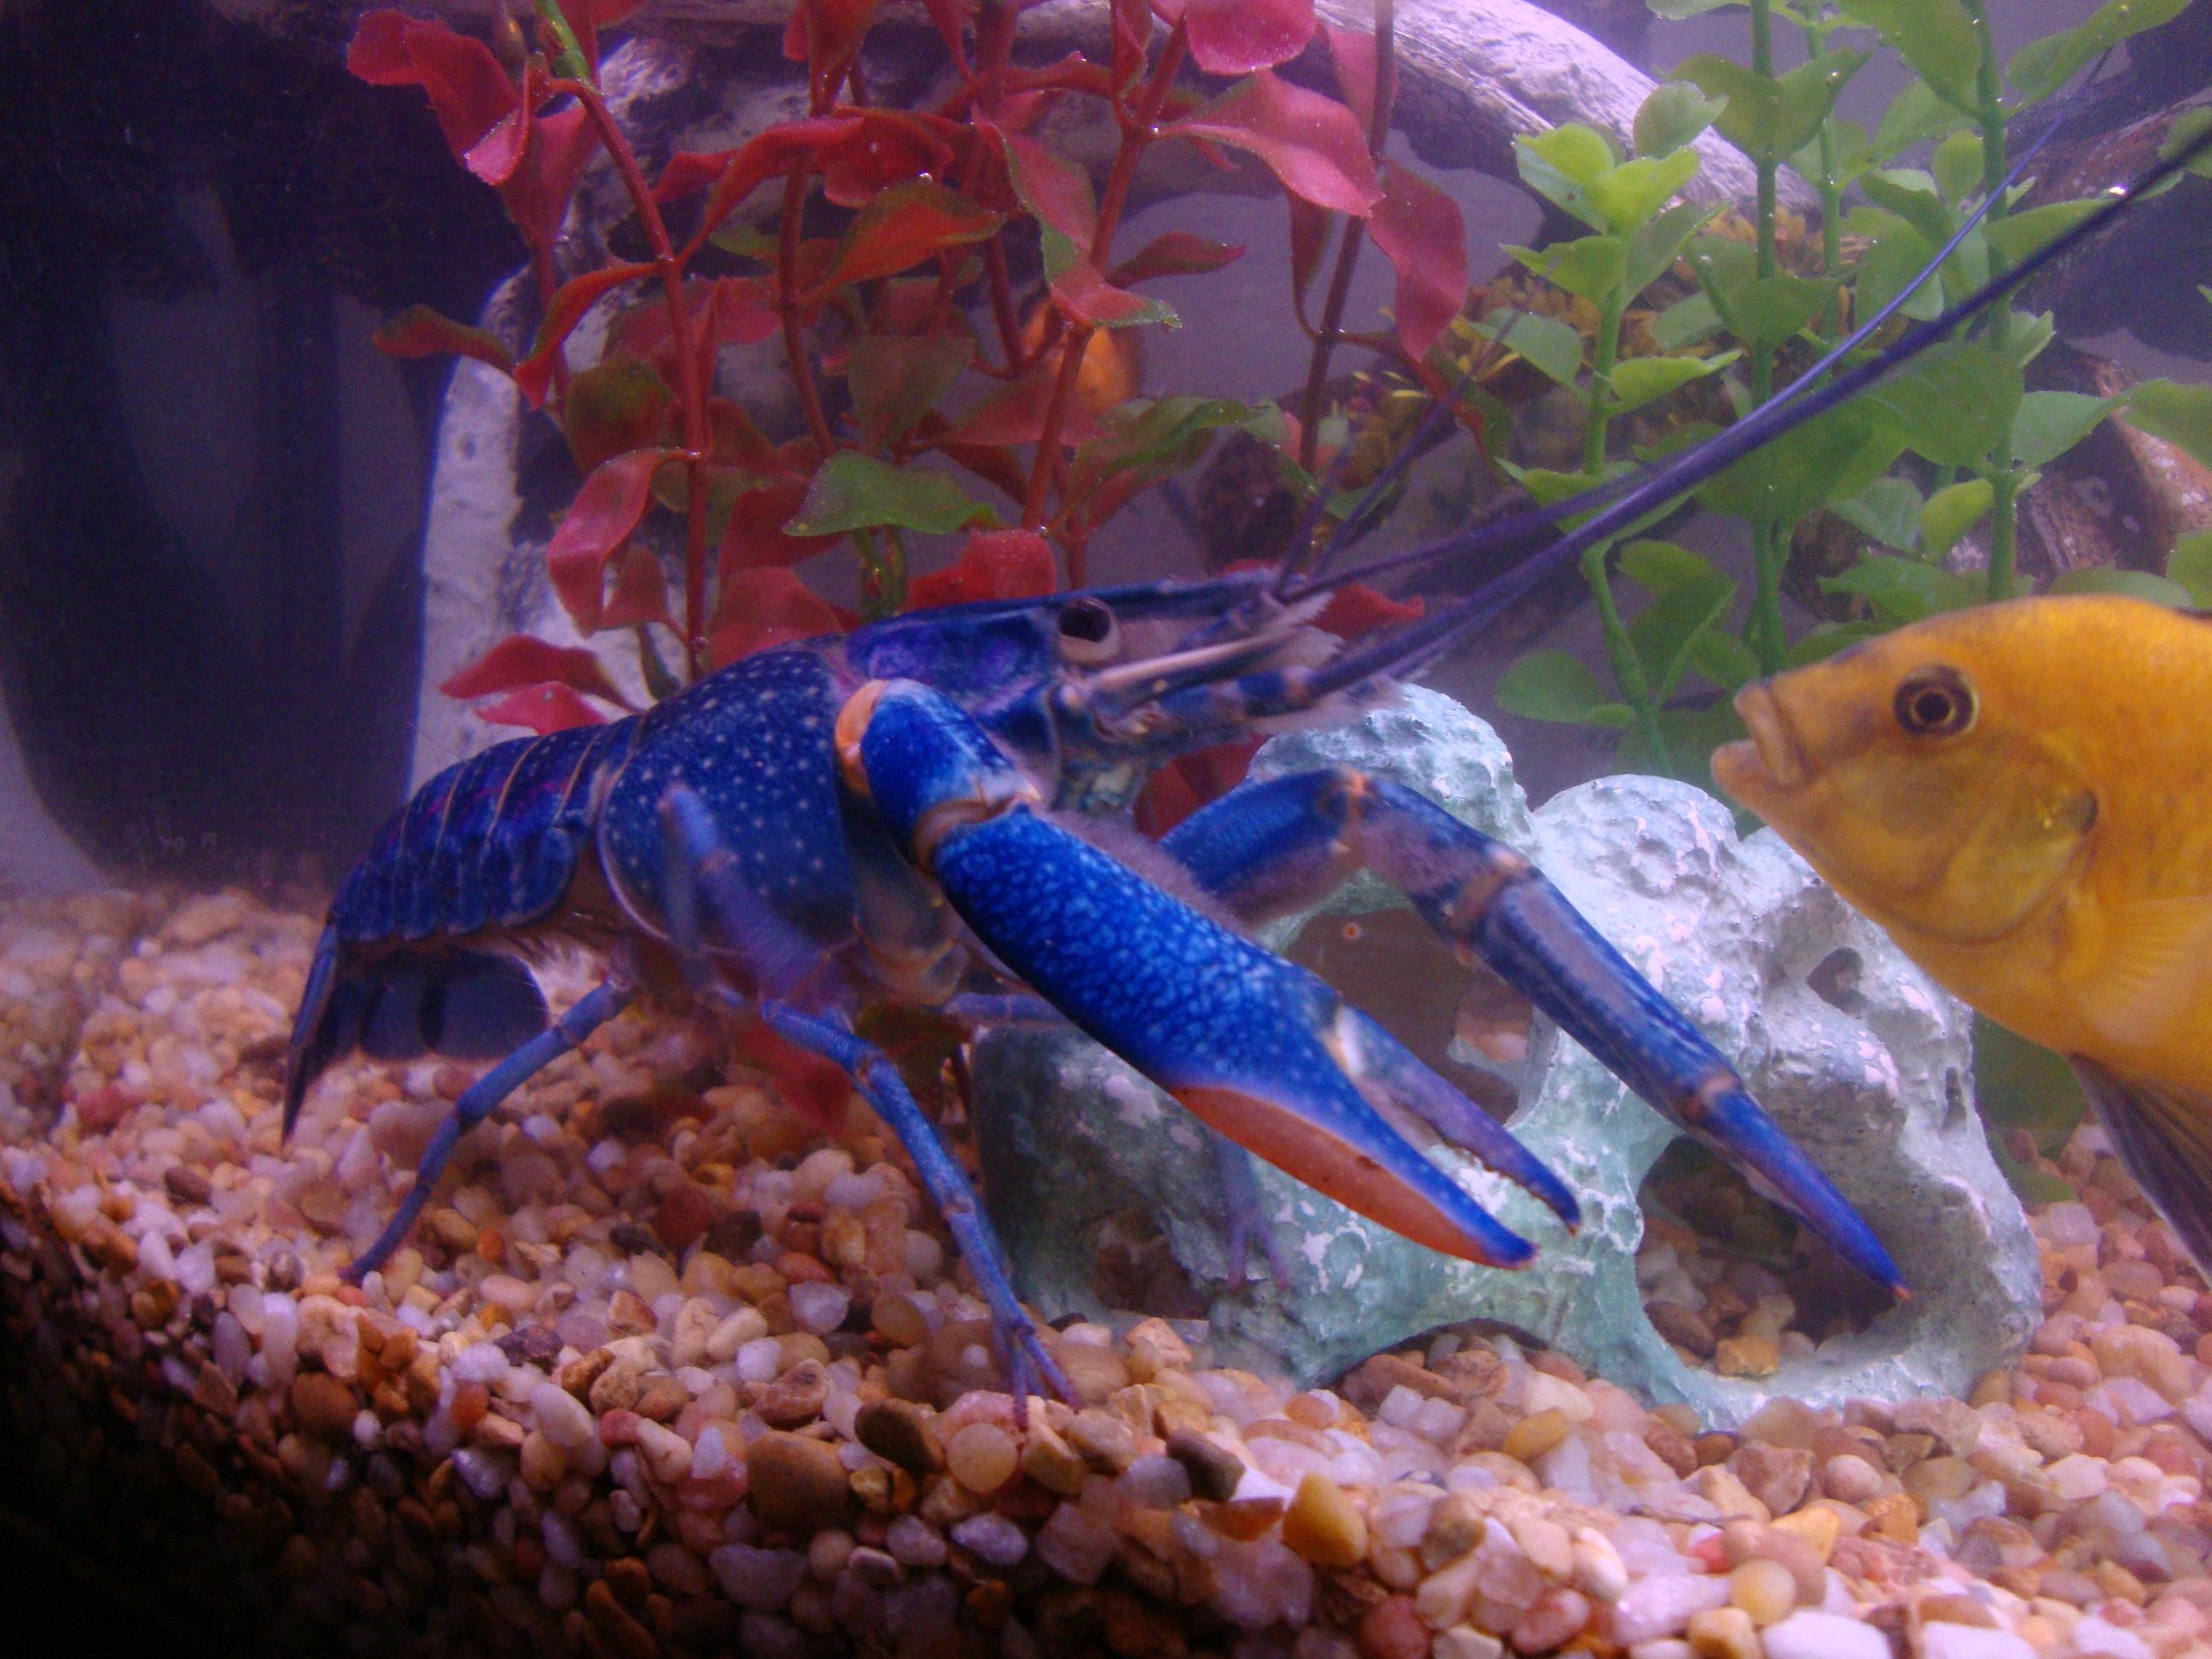 Freshwater aquarium fish species ebook - You Can Keep These In A Fresh Water Aquarium I